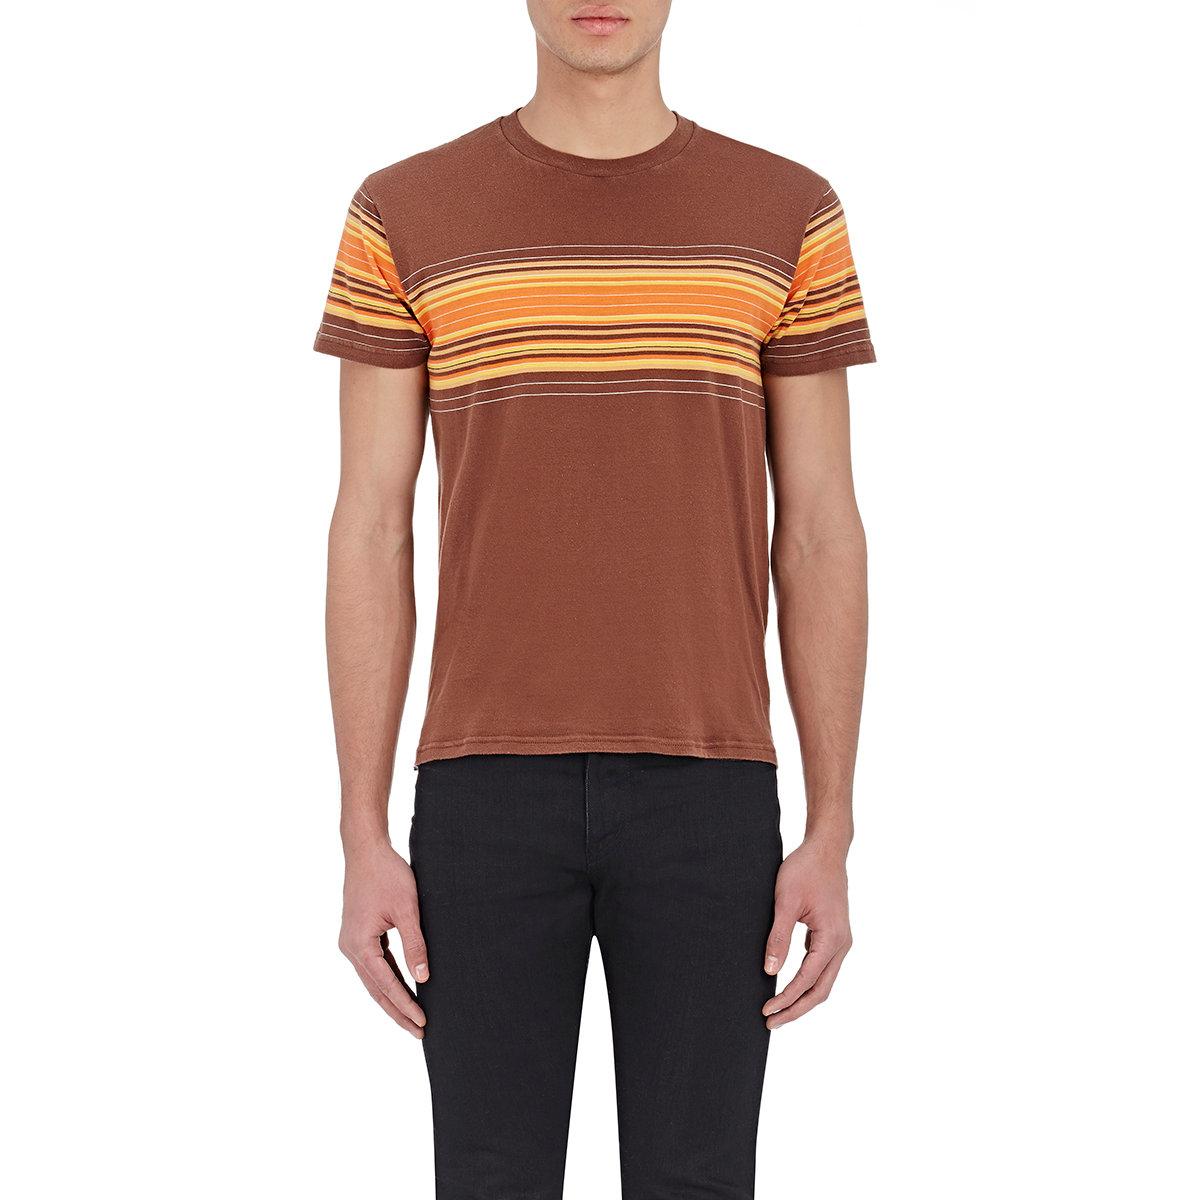 Saint laurent men 39 s sunset striped jersey t shirt in brown for Saint laurent t shirt